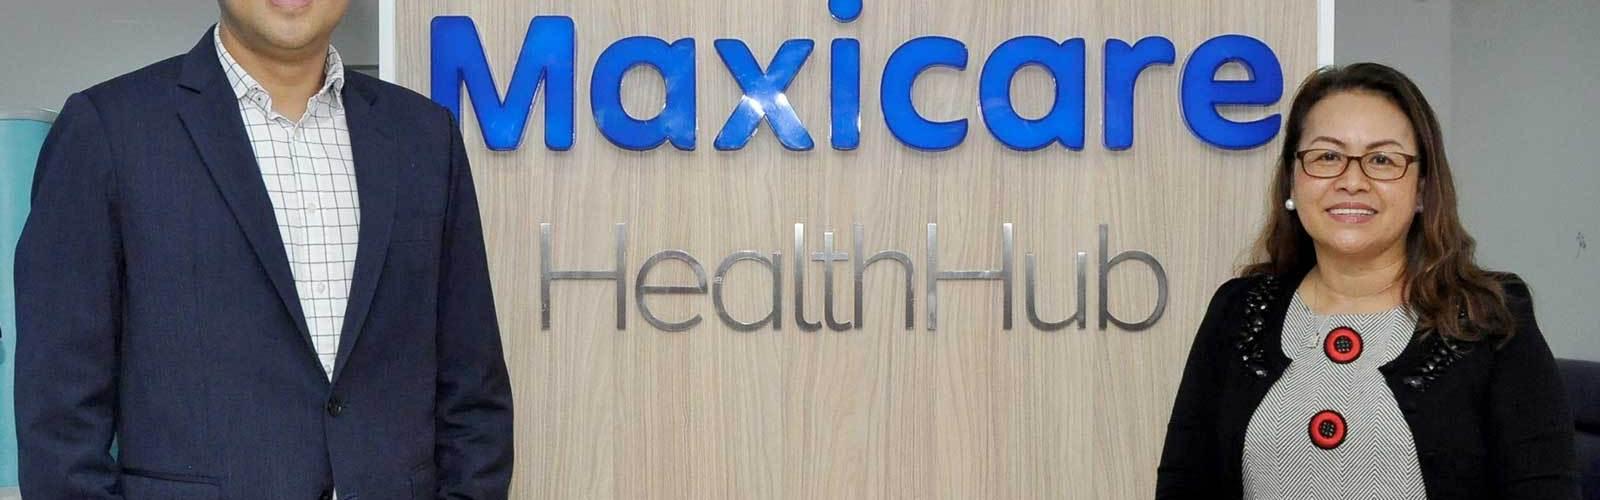 Maxicare president & CEO Christian Argos and Manila Doctors Hospital president Elizabeth Dantes